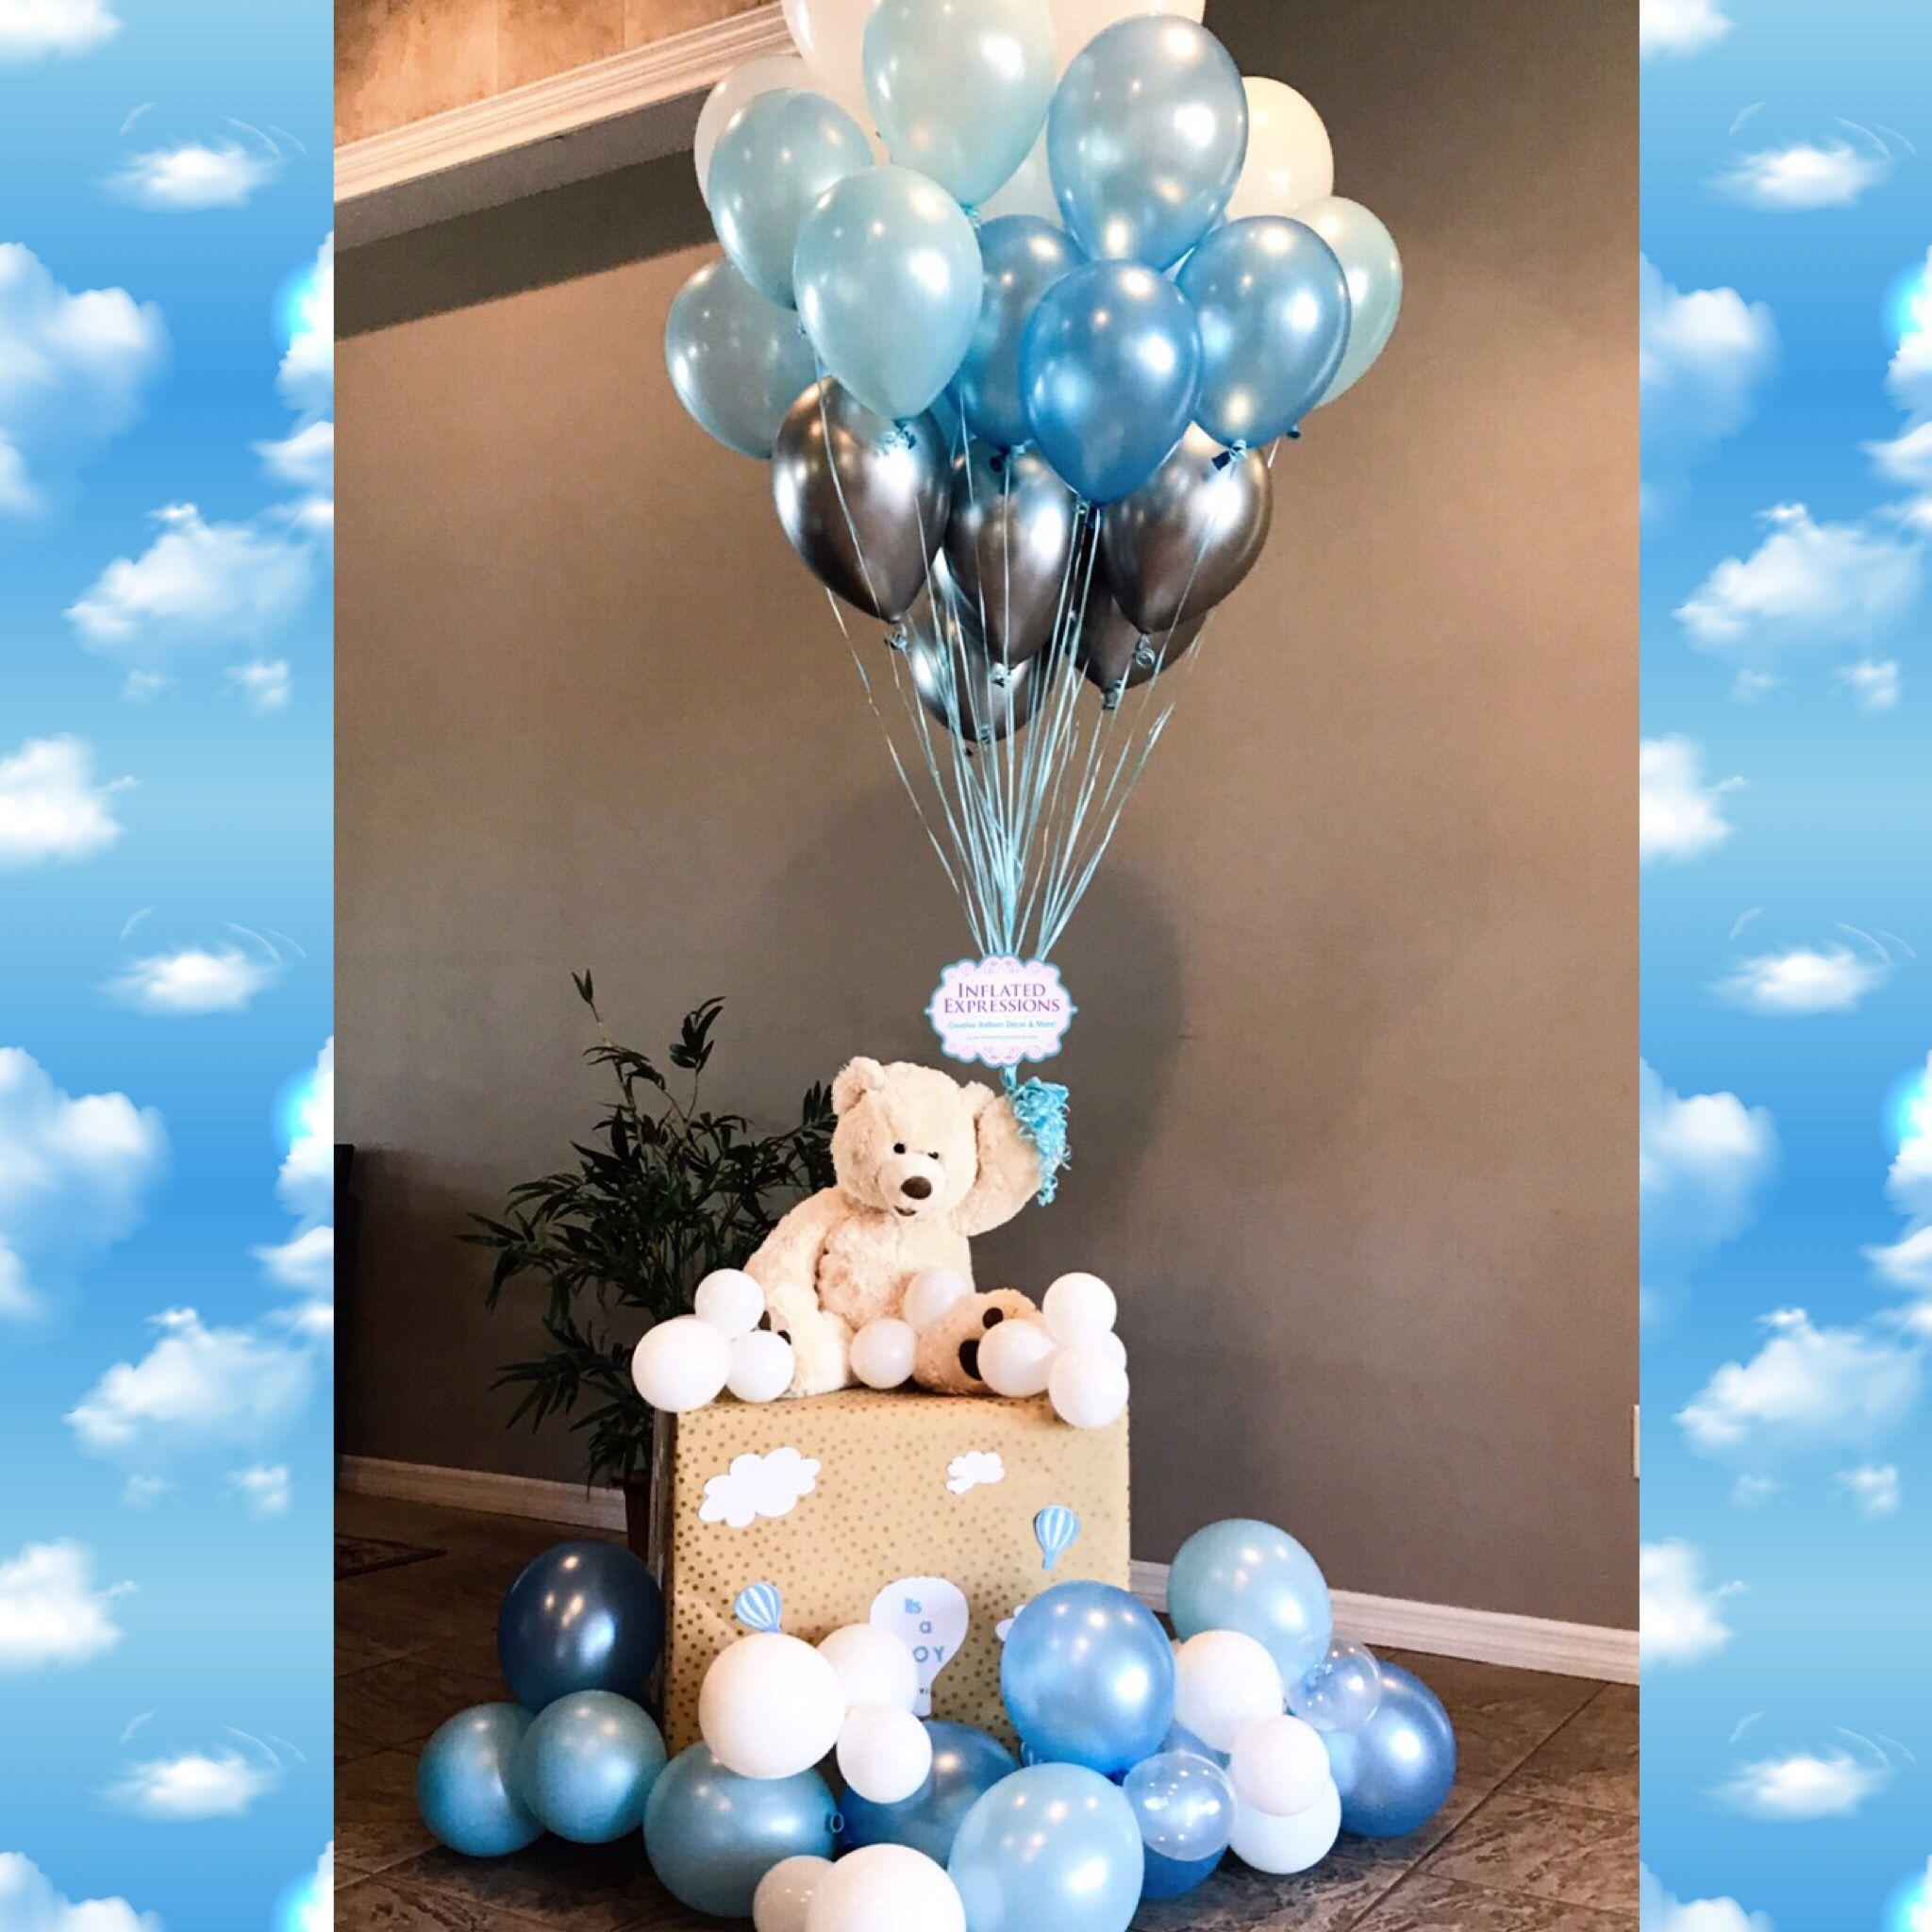 Teddy Bear Balloon Baby Shower Decorations Baby Shower Balloon Decorations Baby Shower Centerpieces Bear Baby Shower Theme